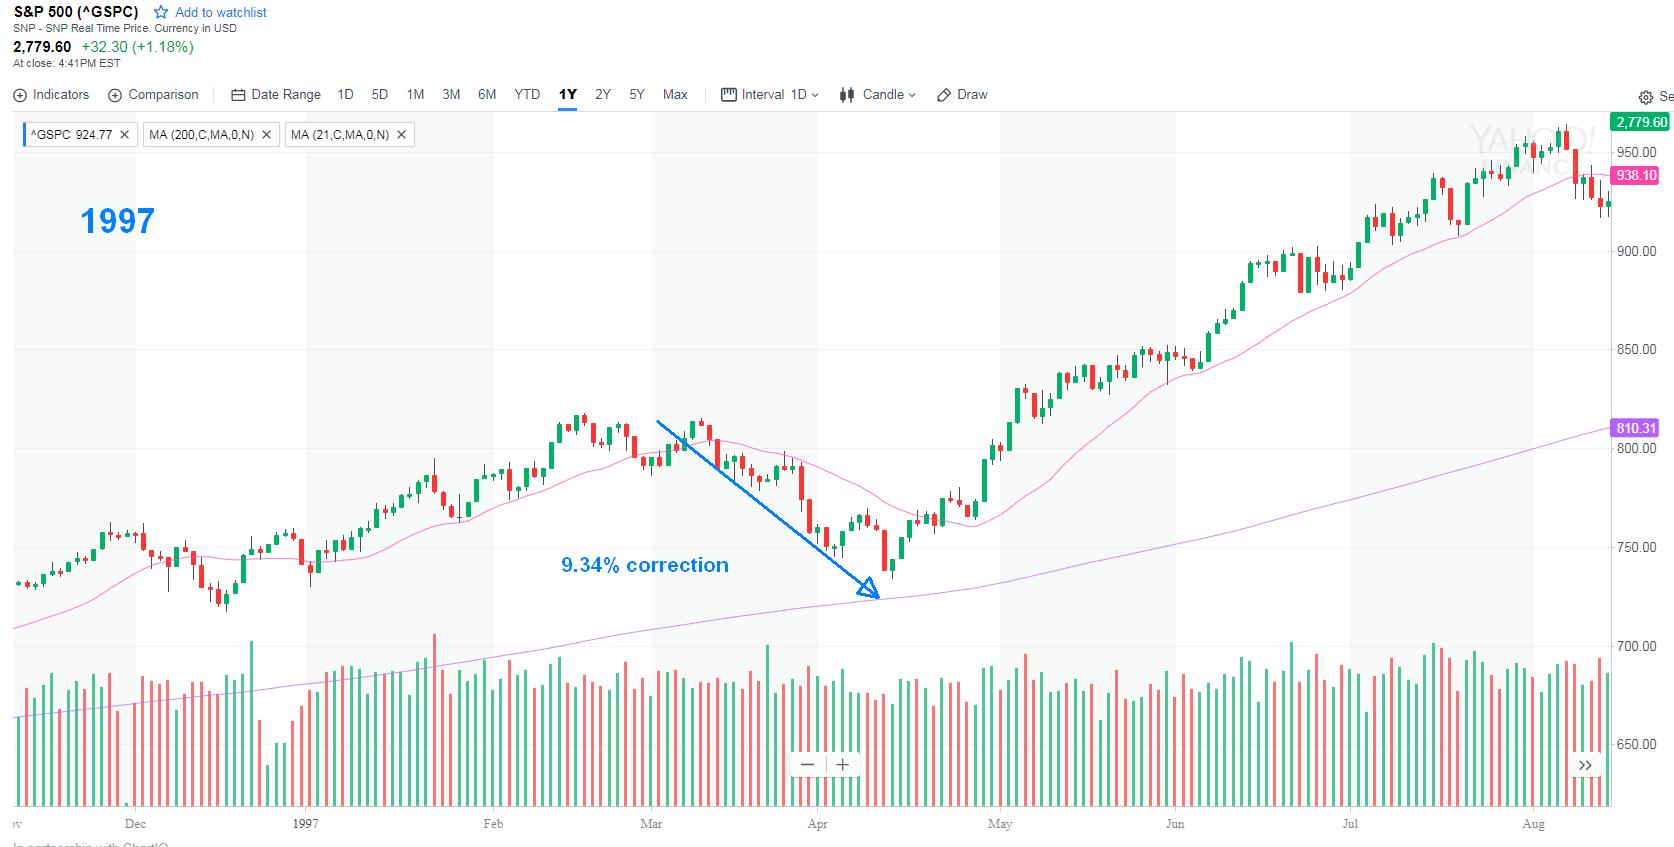 S&P500 - 2012